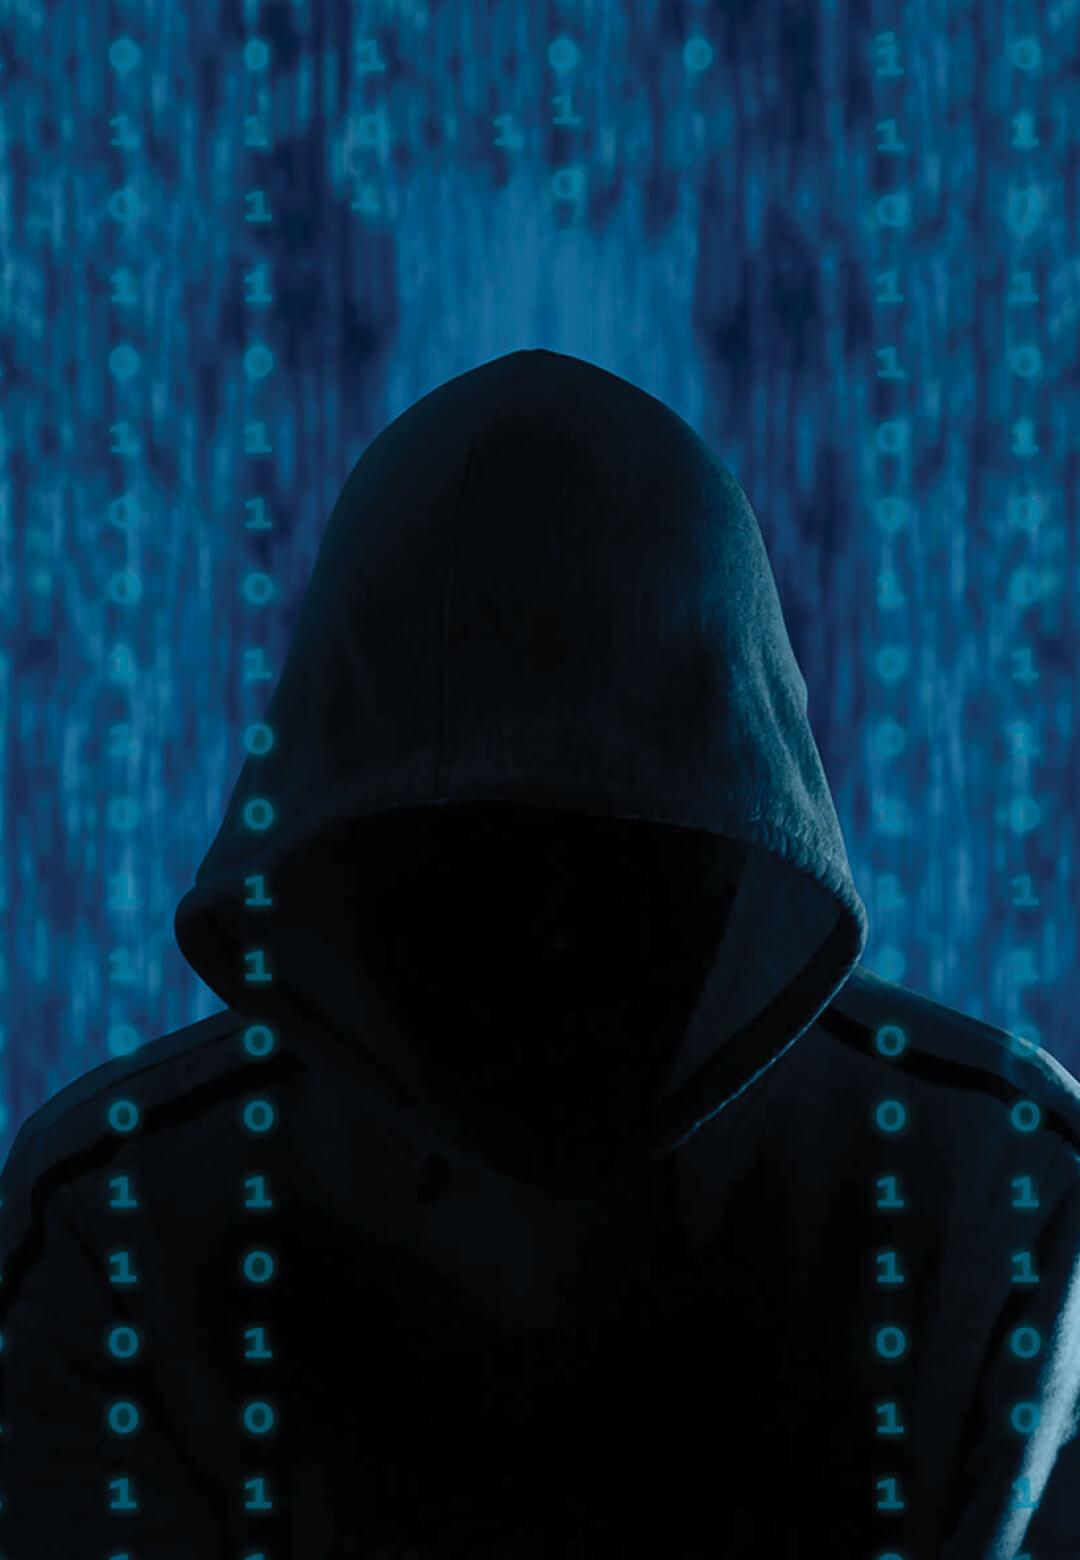 Anonymity | Digital Legacies | Julius Wiedemann | STIRworld